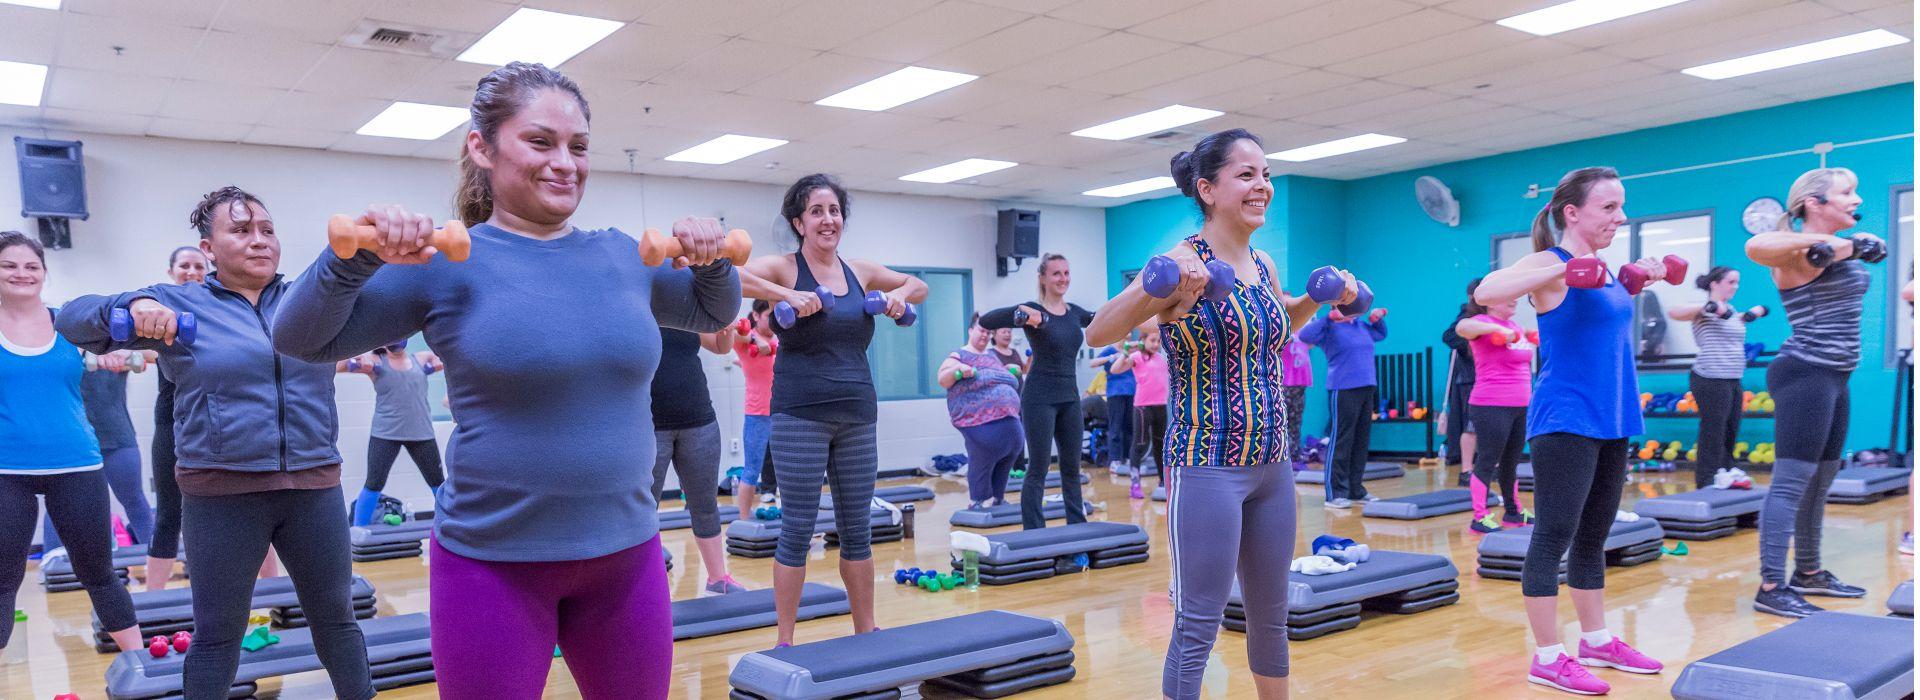 Auburn Valley YMCA | YMCA of Greater Seattle